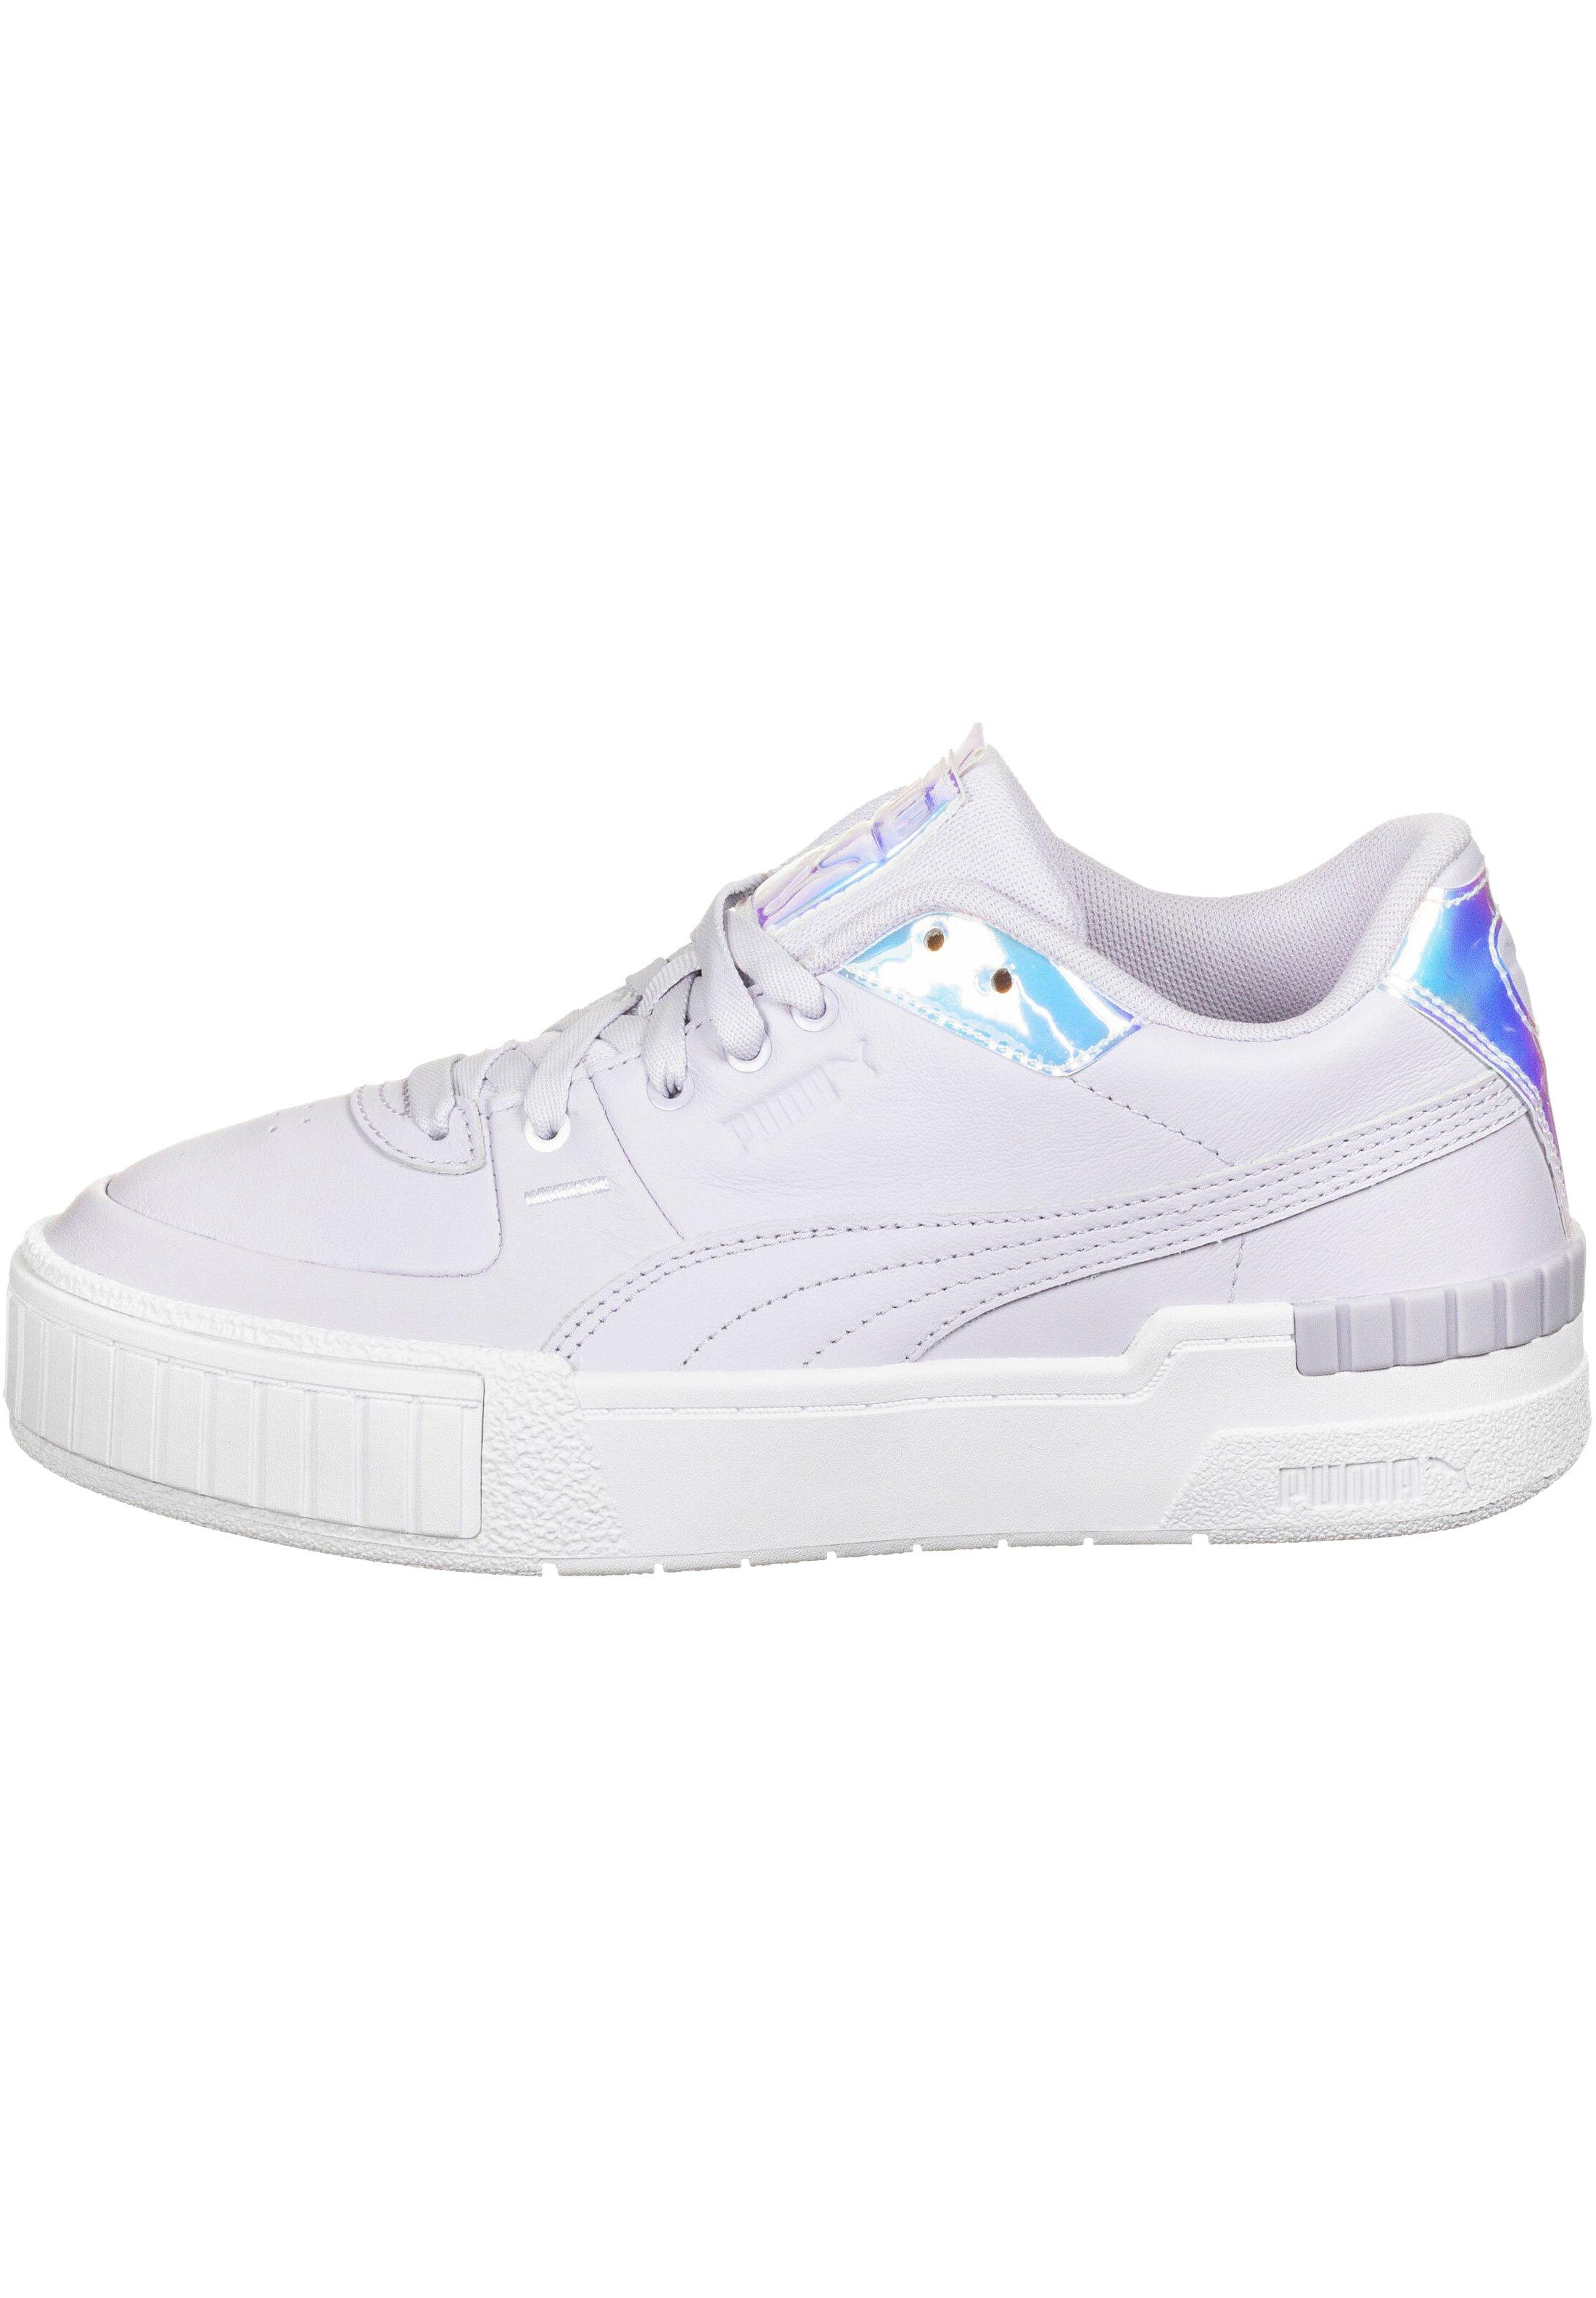 puma femme chaussures cali sport glow